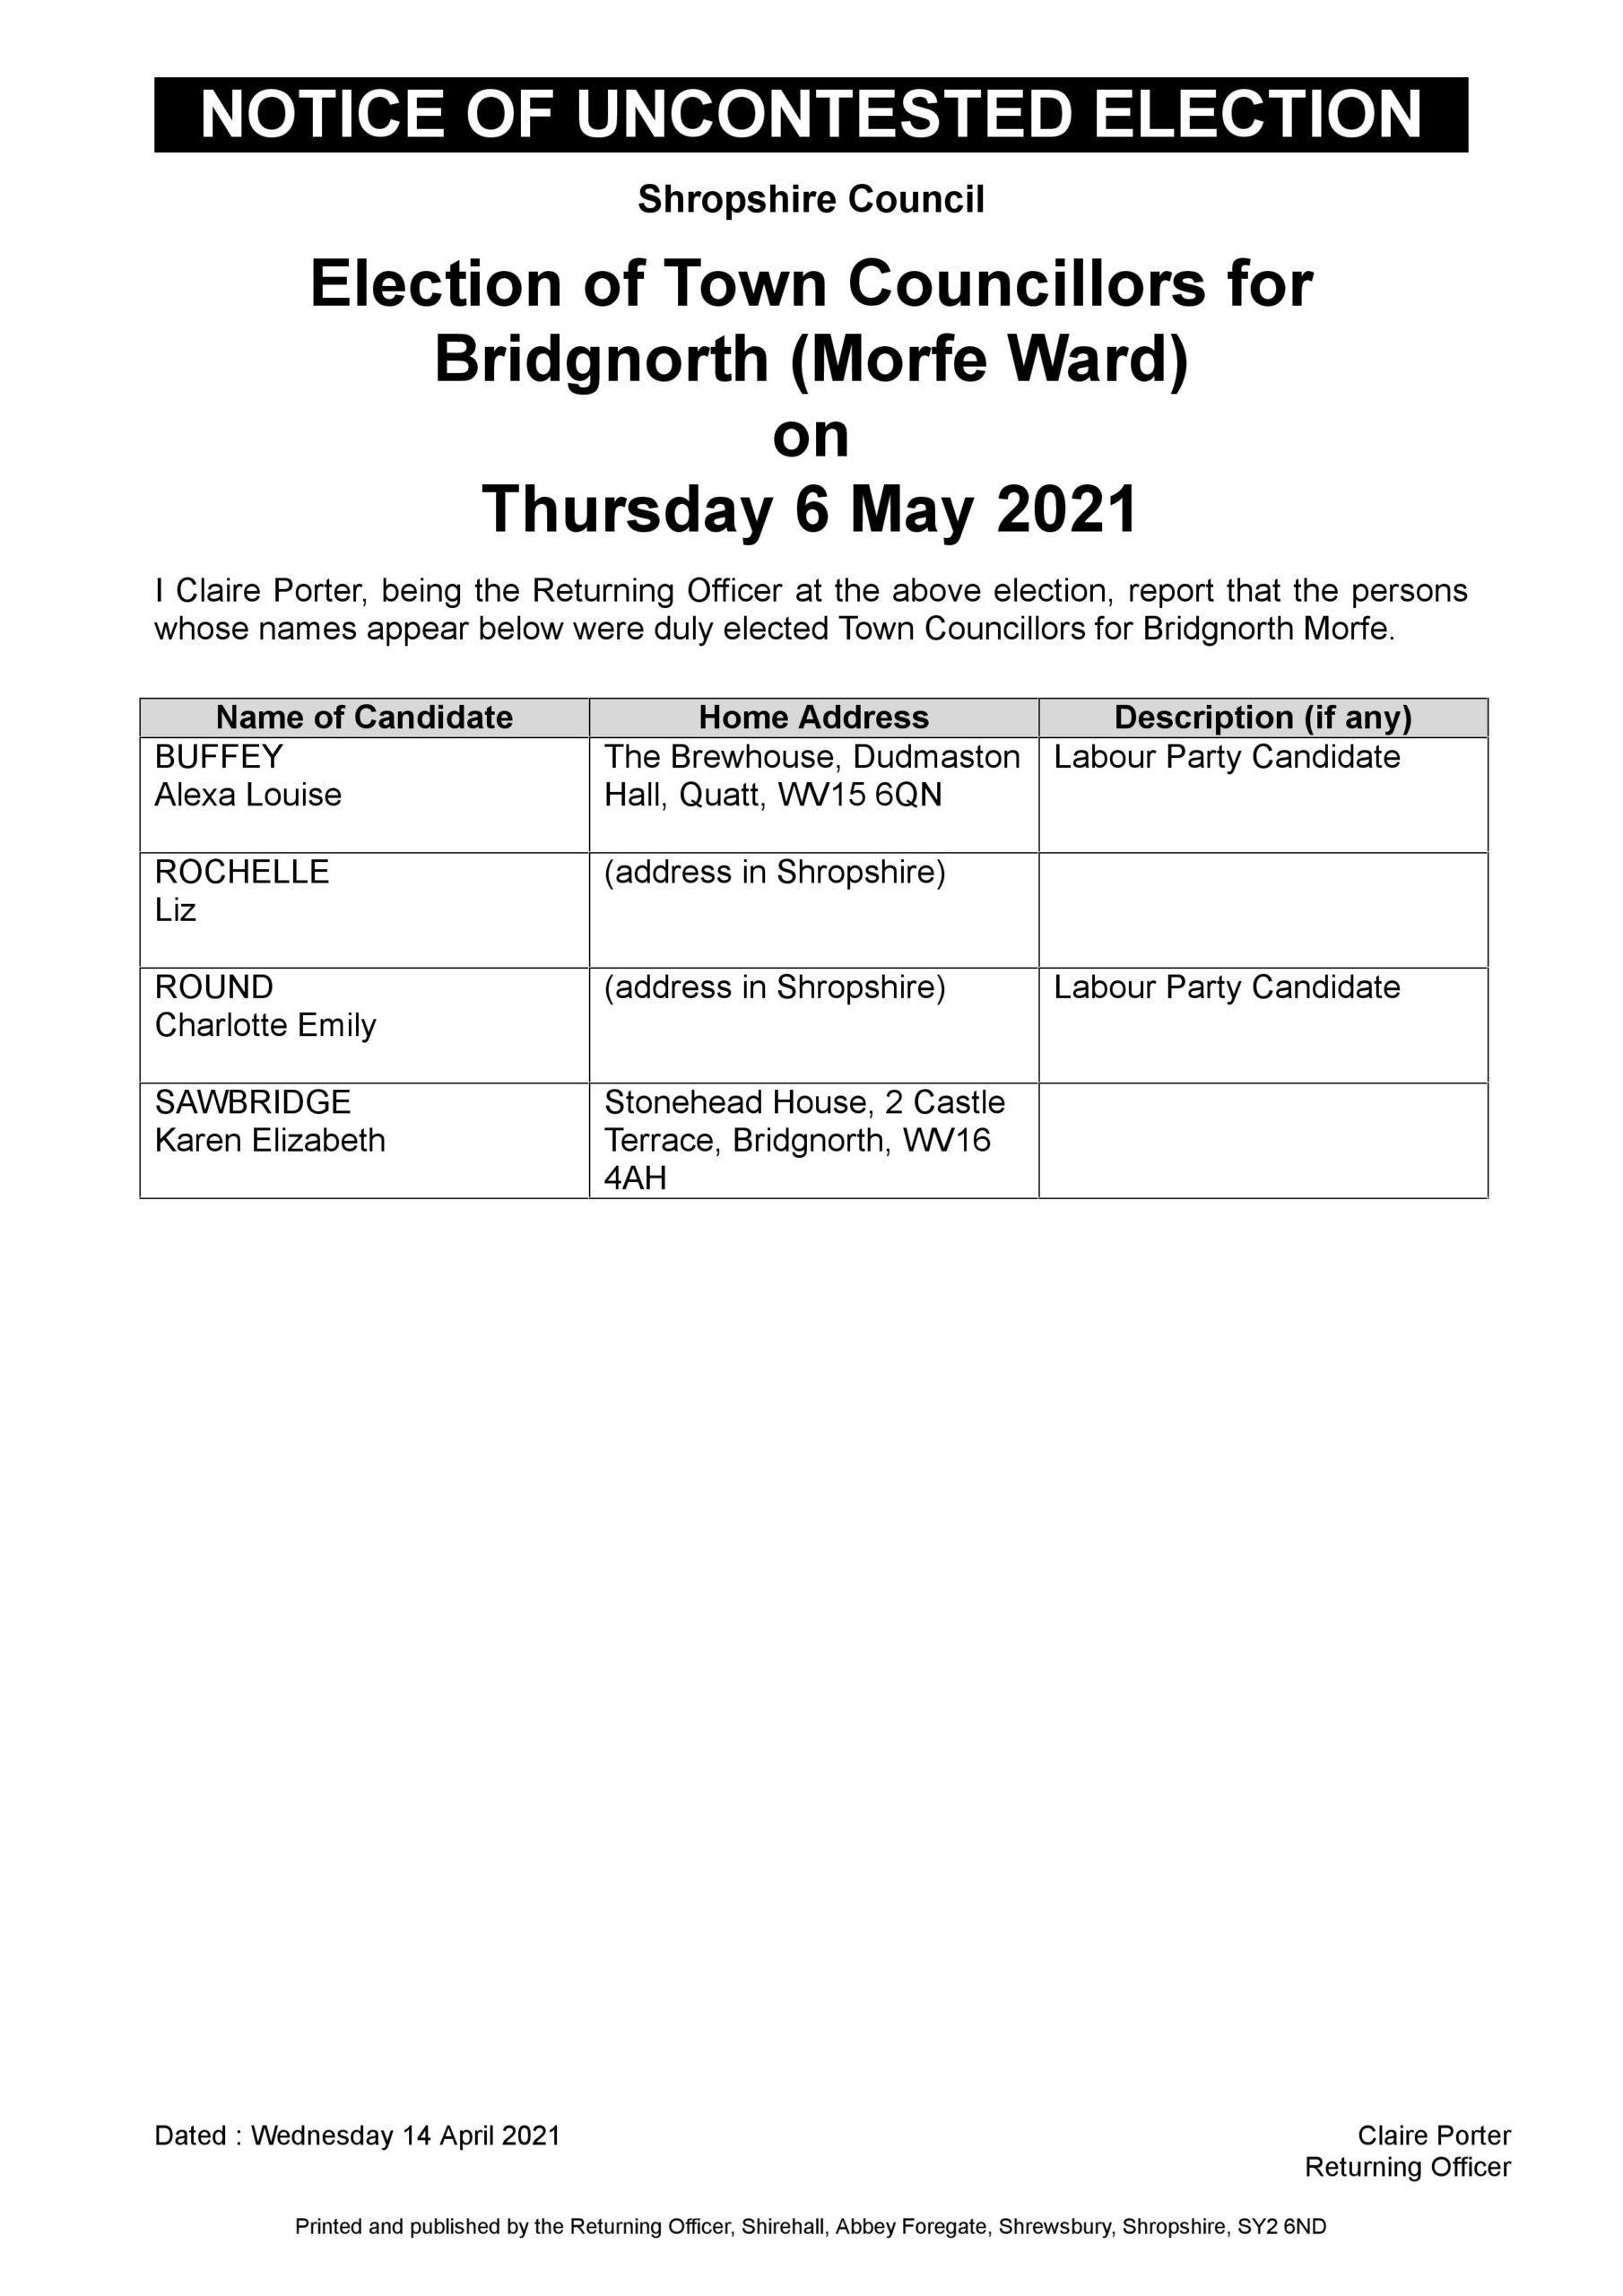 Uncontested Election Bridgnorth Morfe